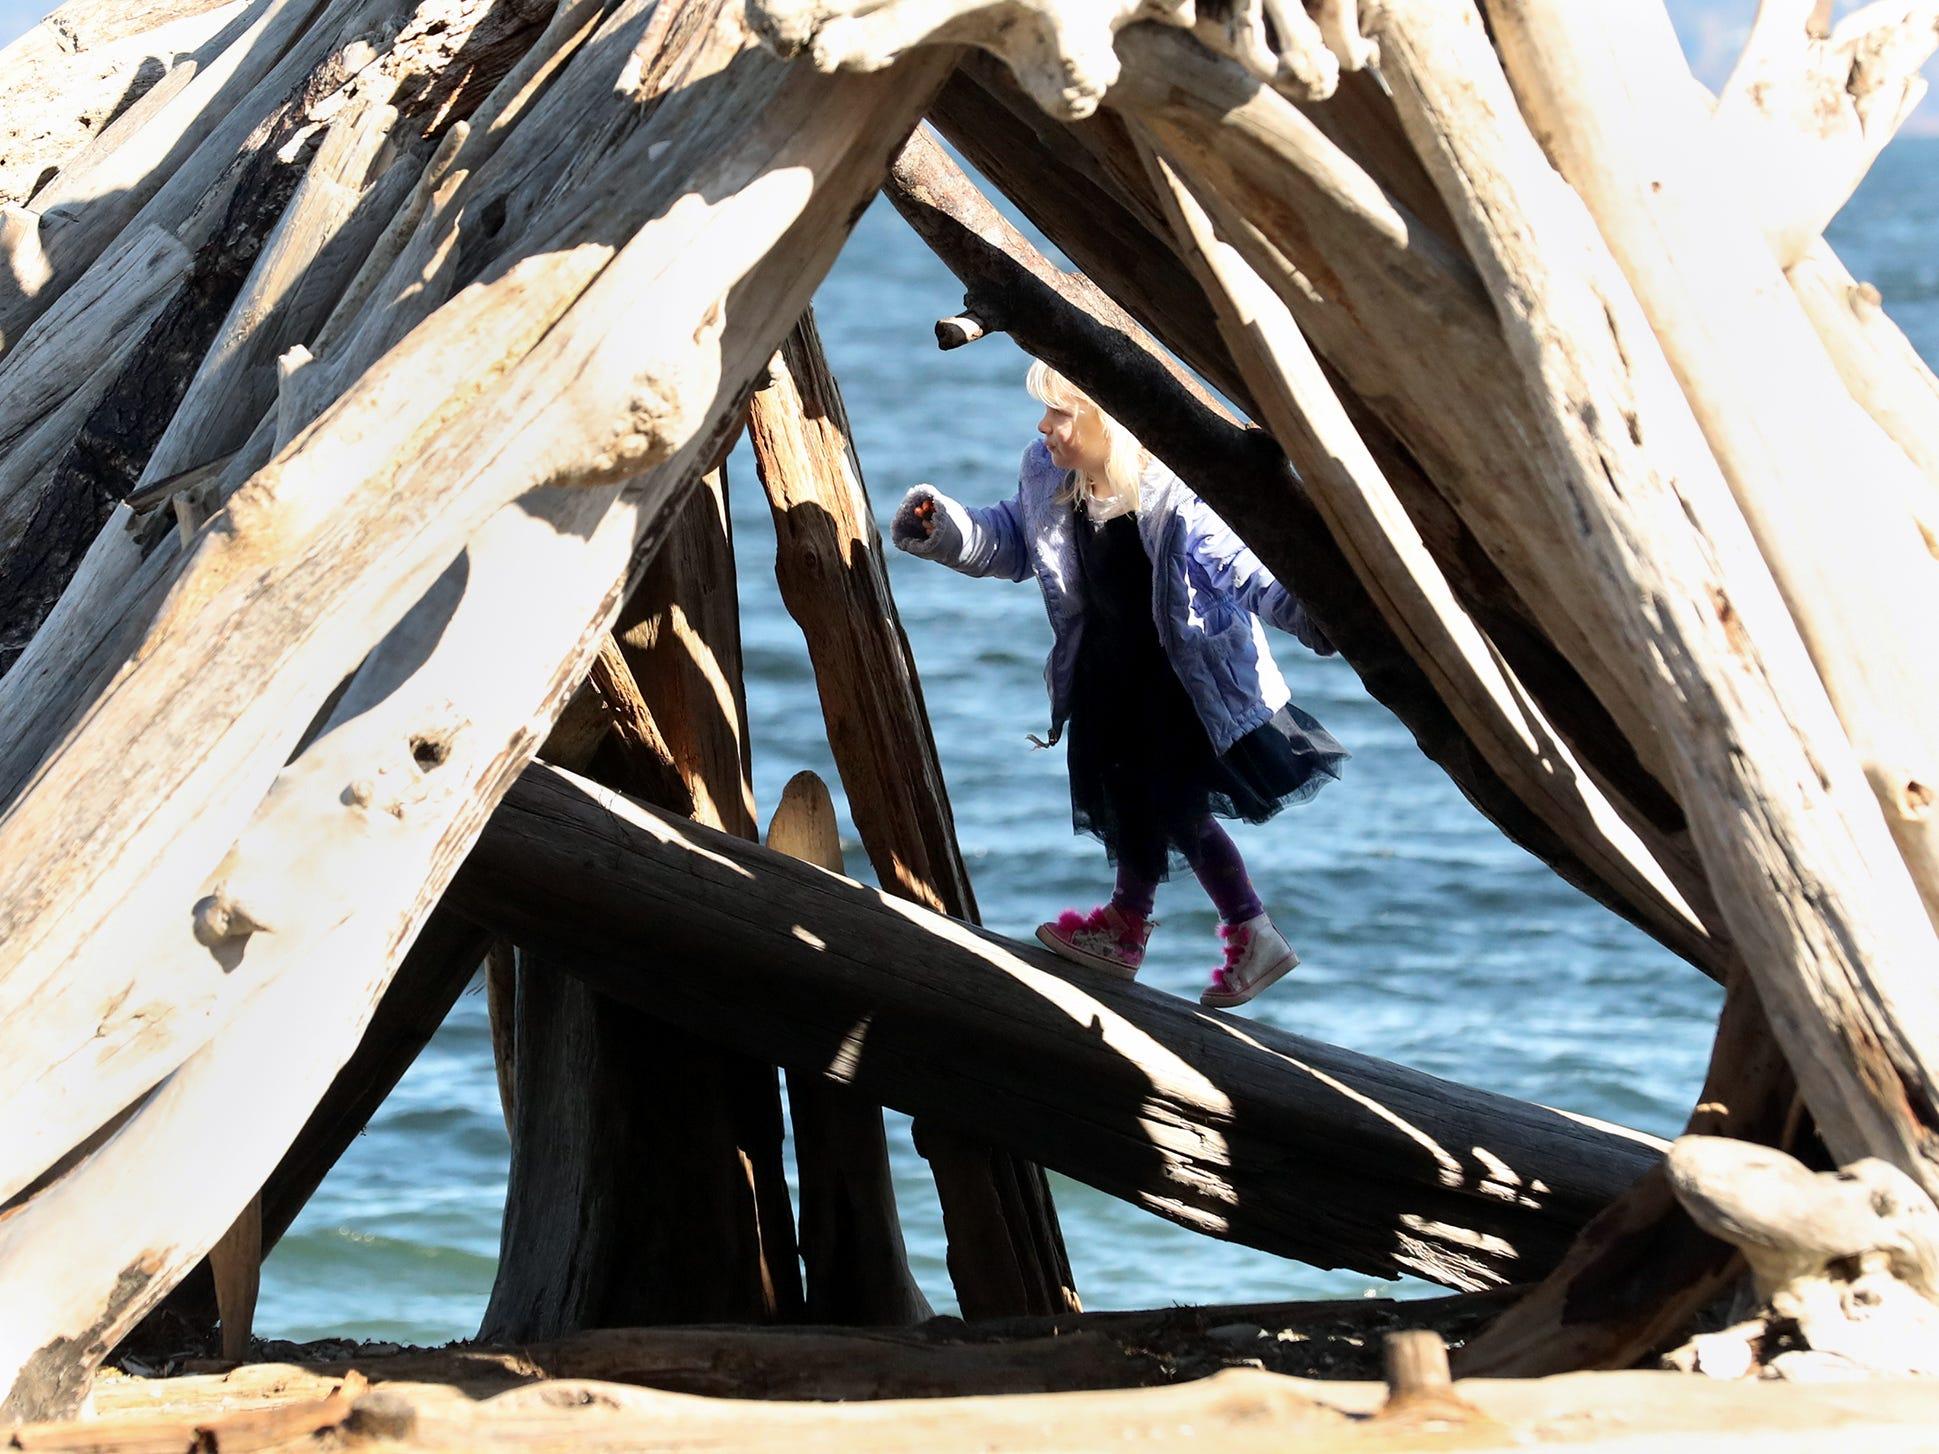 Lillian Hutton, 4, is framed by the logs of a driftwood fort at Bainbridge Island's Fay Bainbridge Park on a sunny Friday, March 1, 2019.